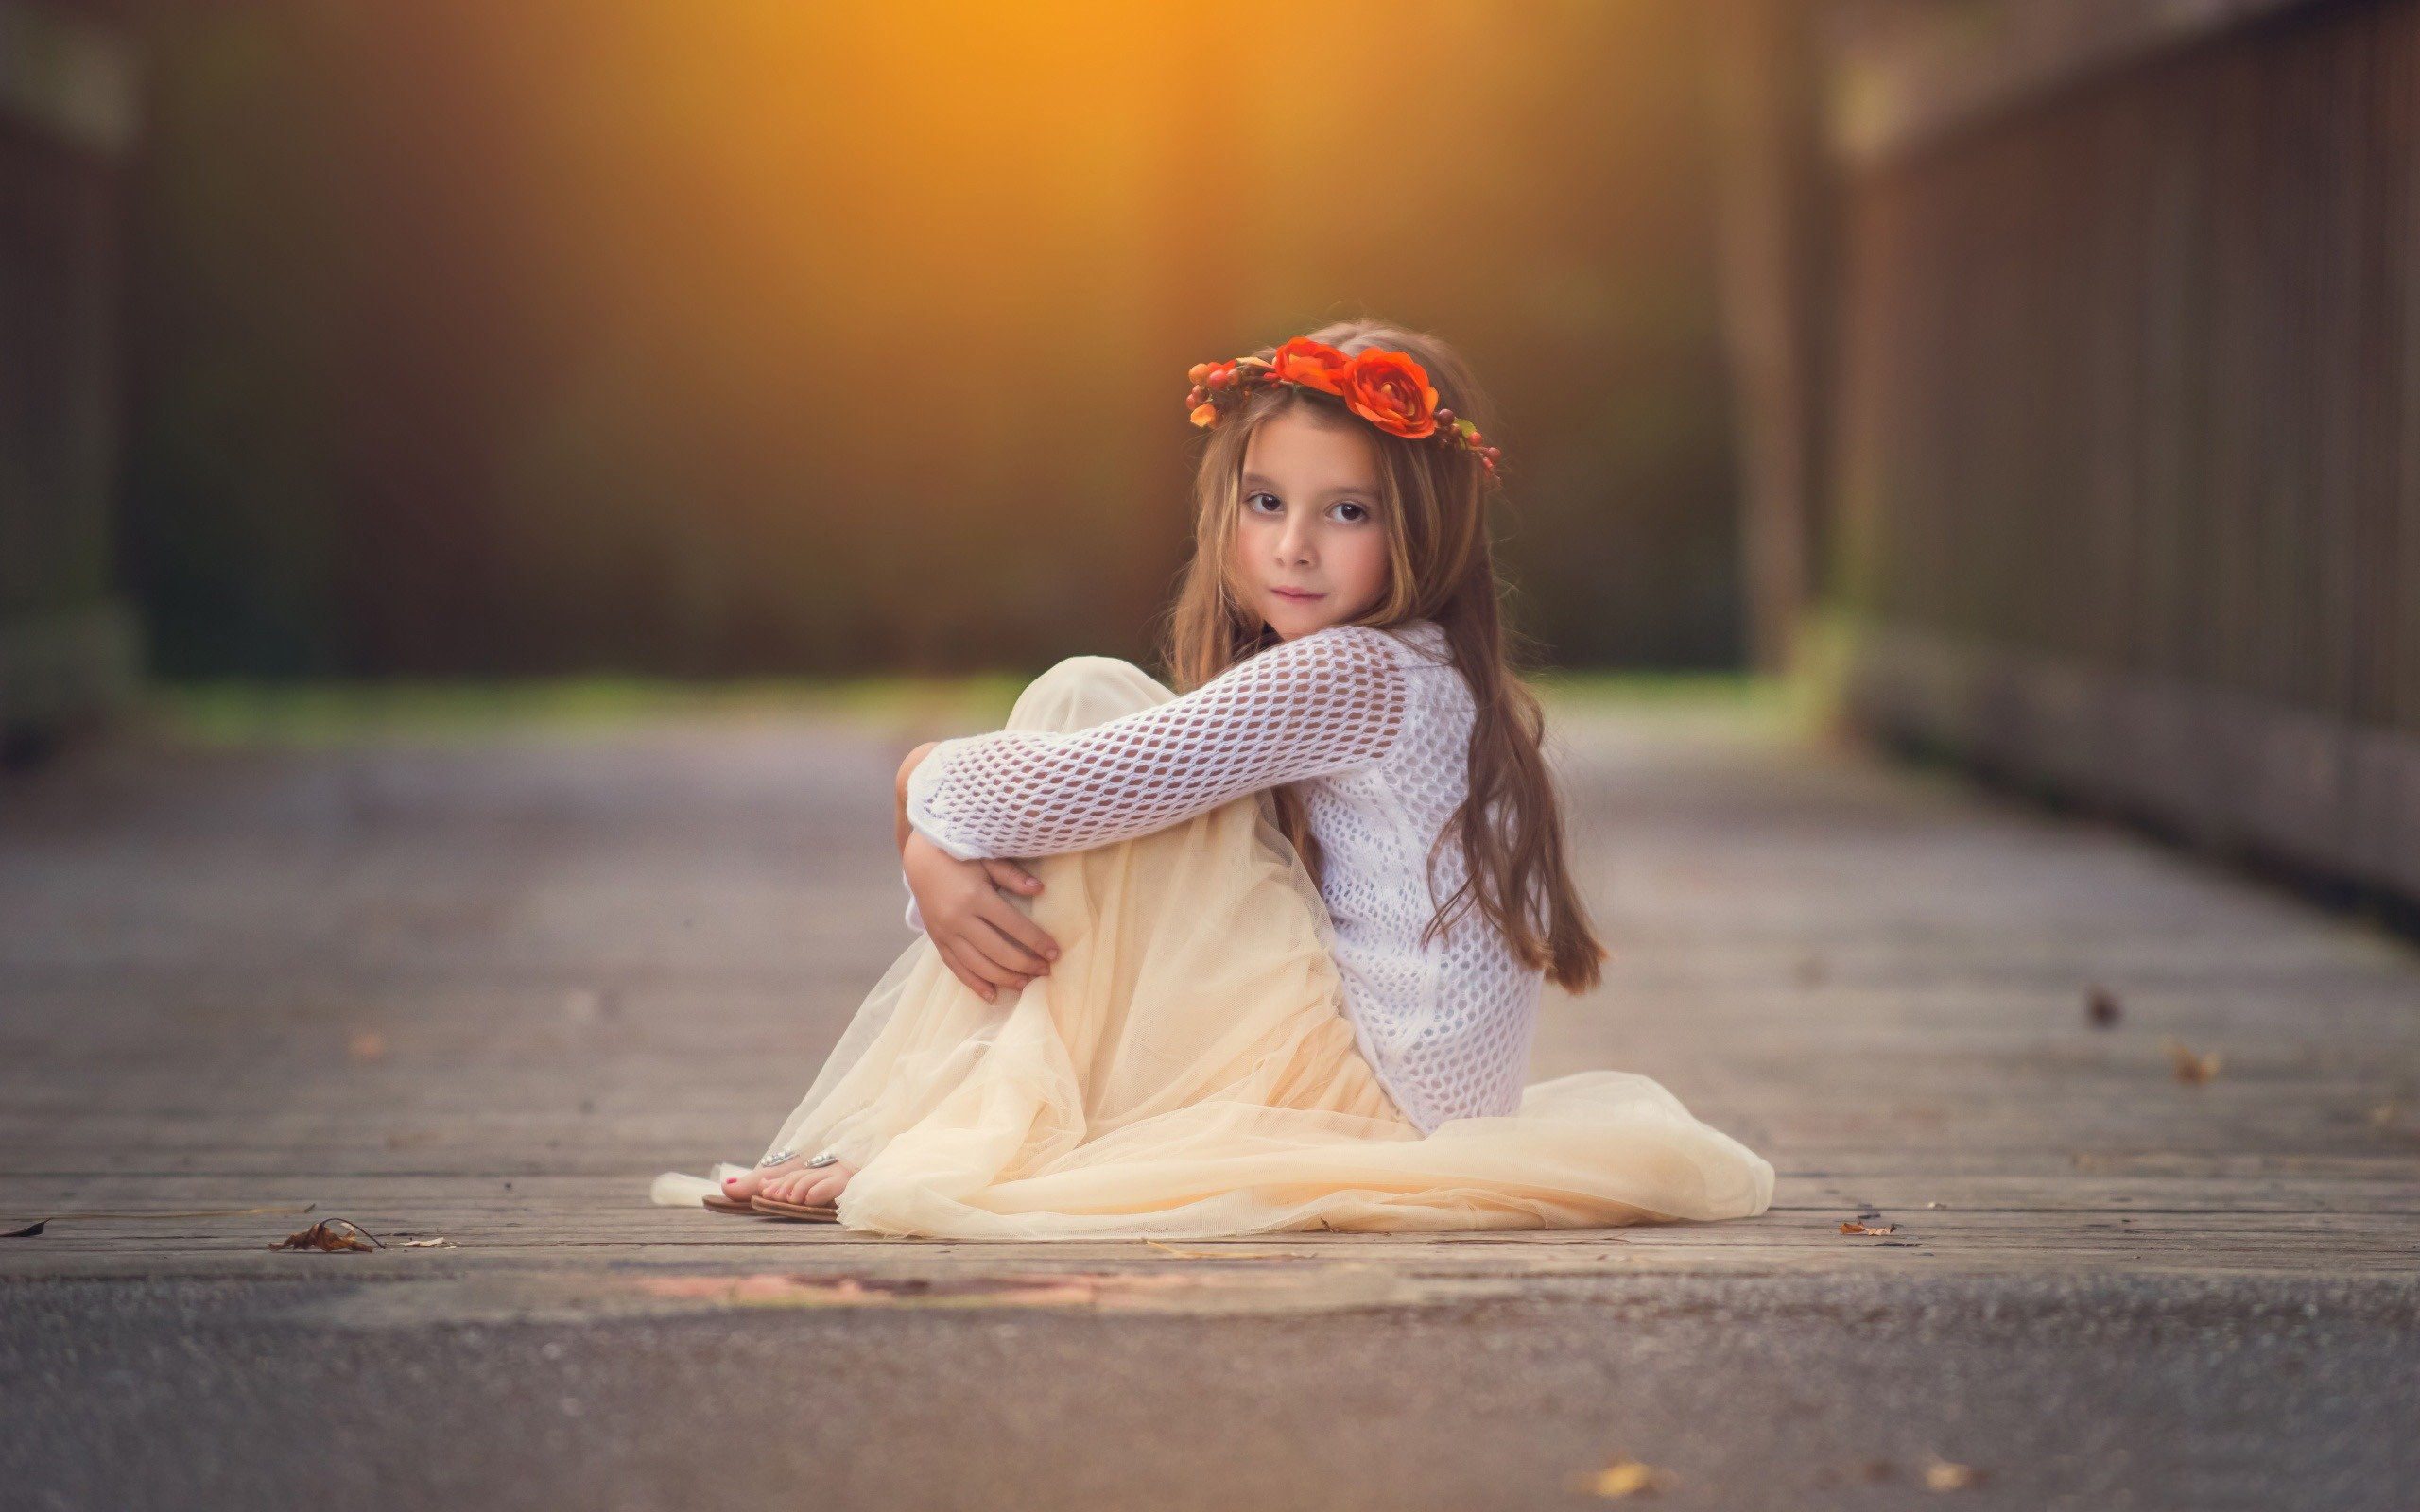 soft child kids girl mood wallpaper background 2560x1600